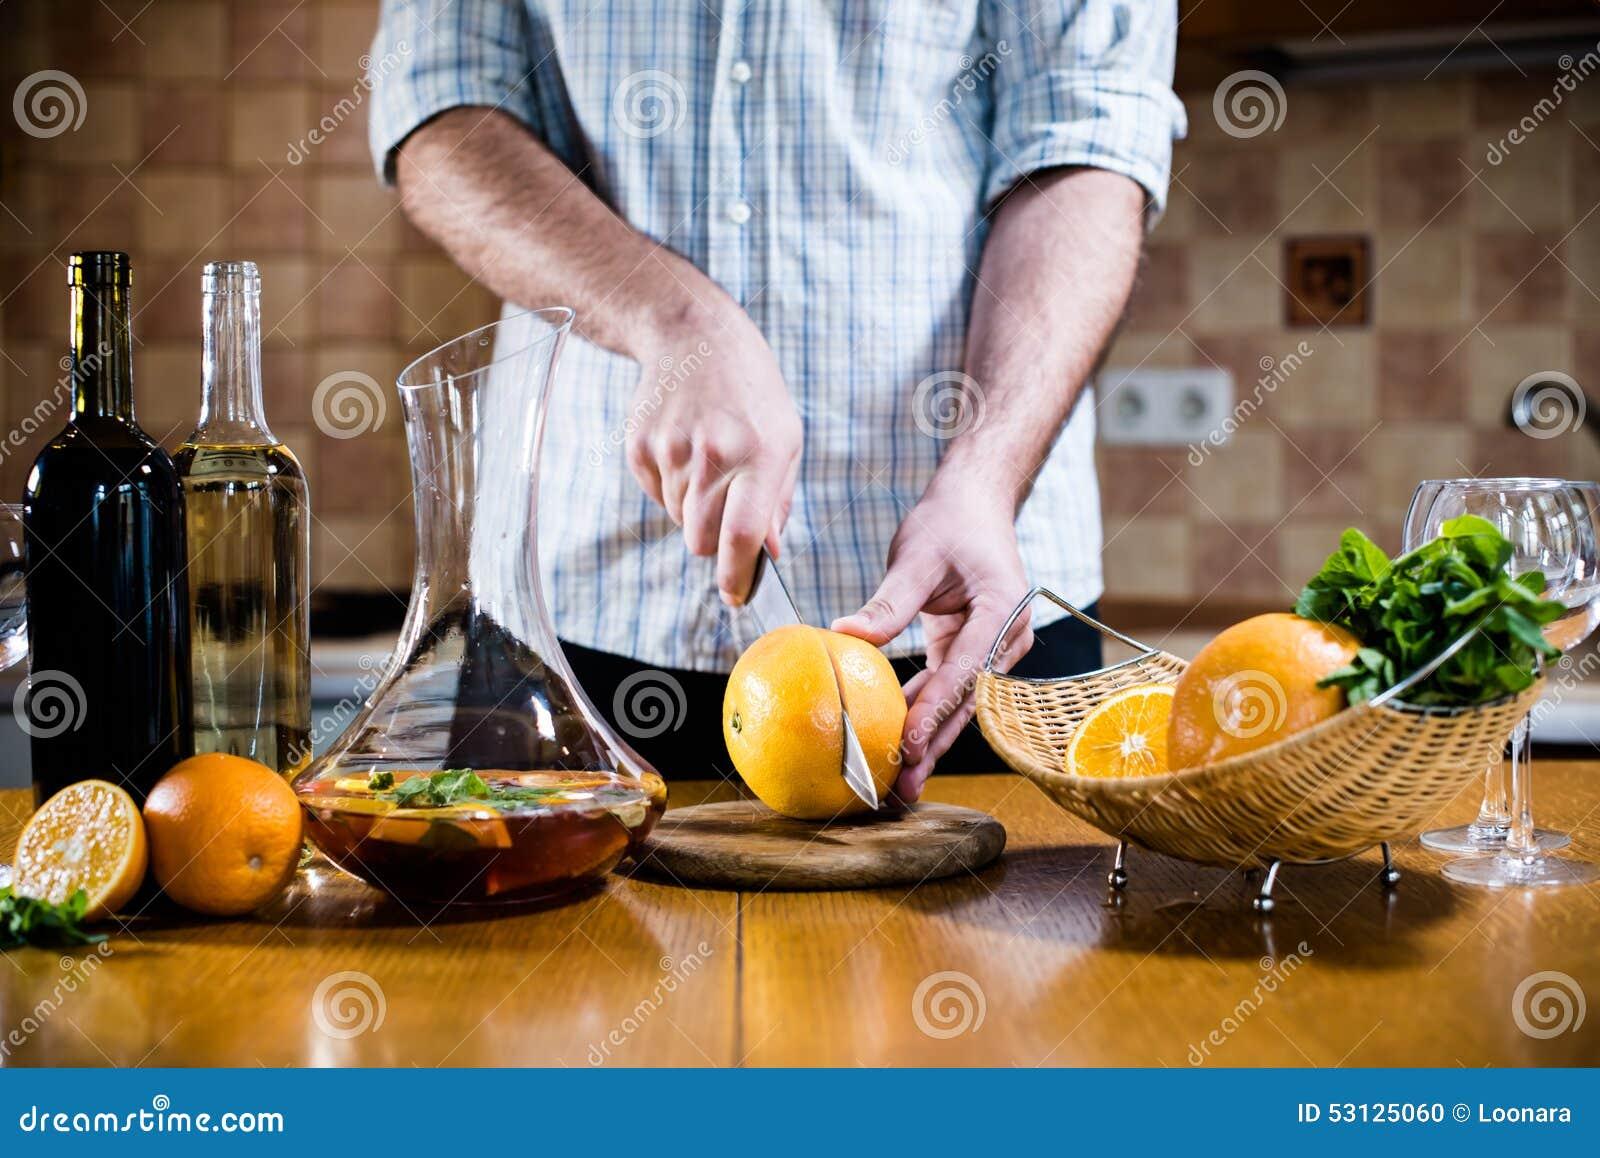 De mens snijdt verse grapefruits